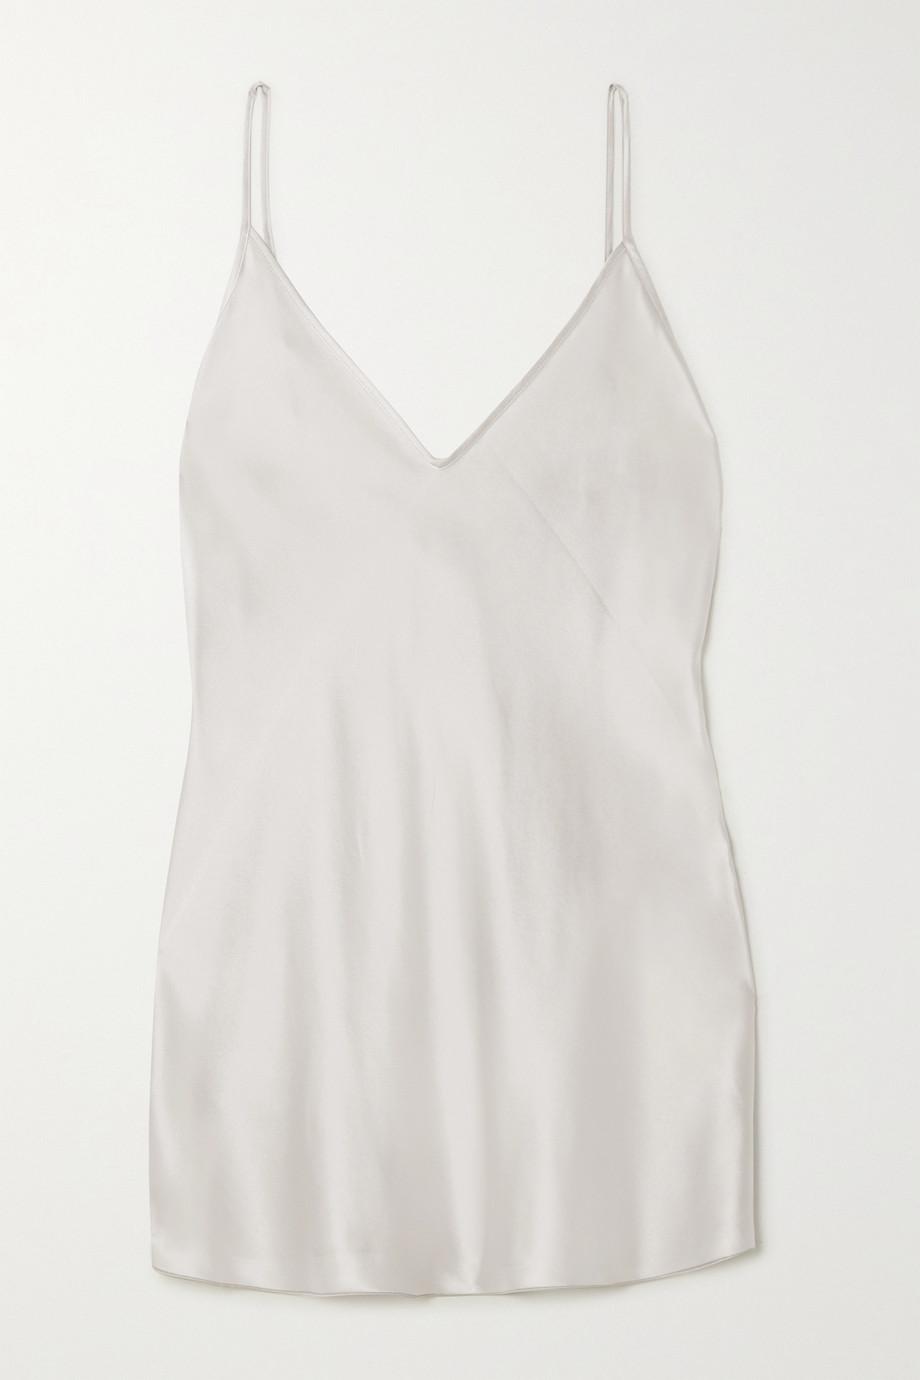 Max Mara Leisure Lucca silk-blend camisole